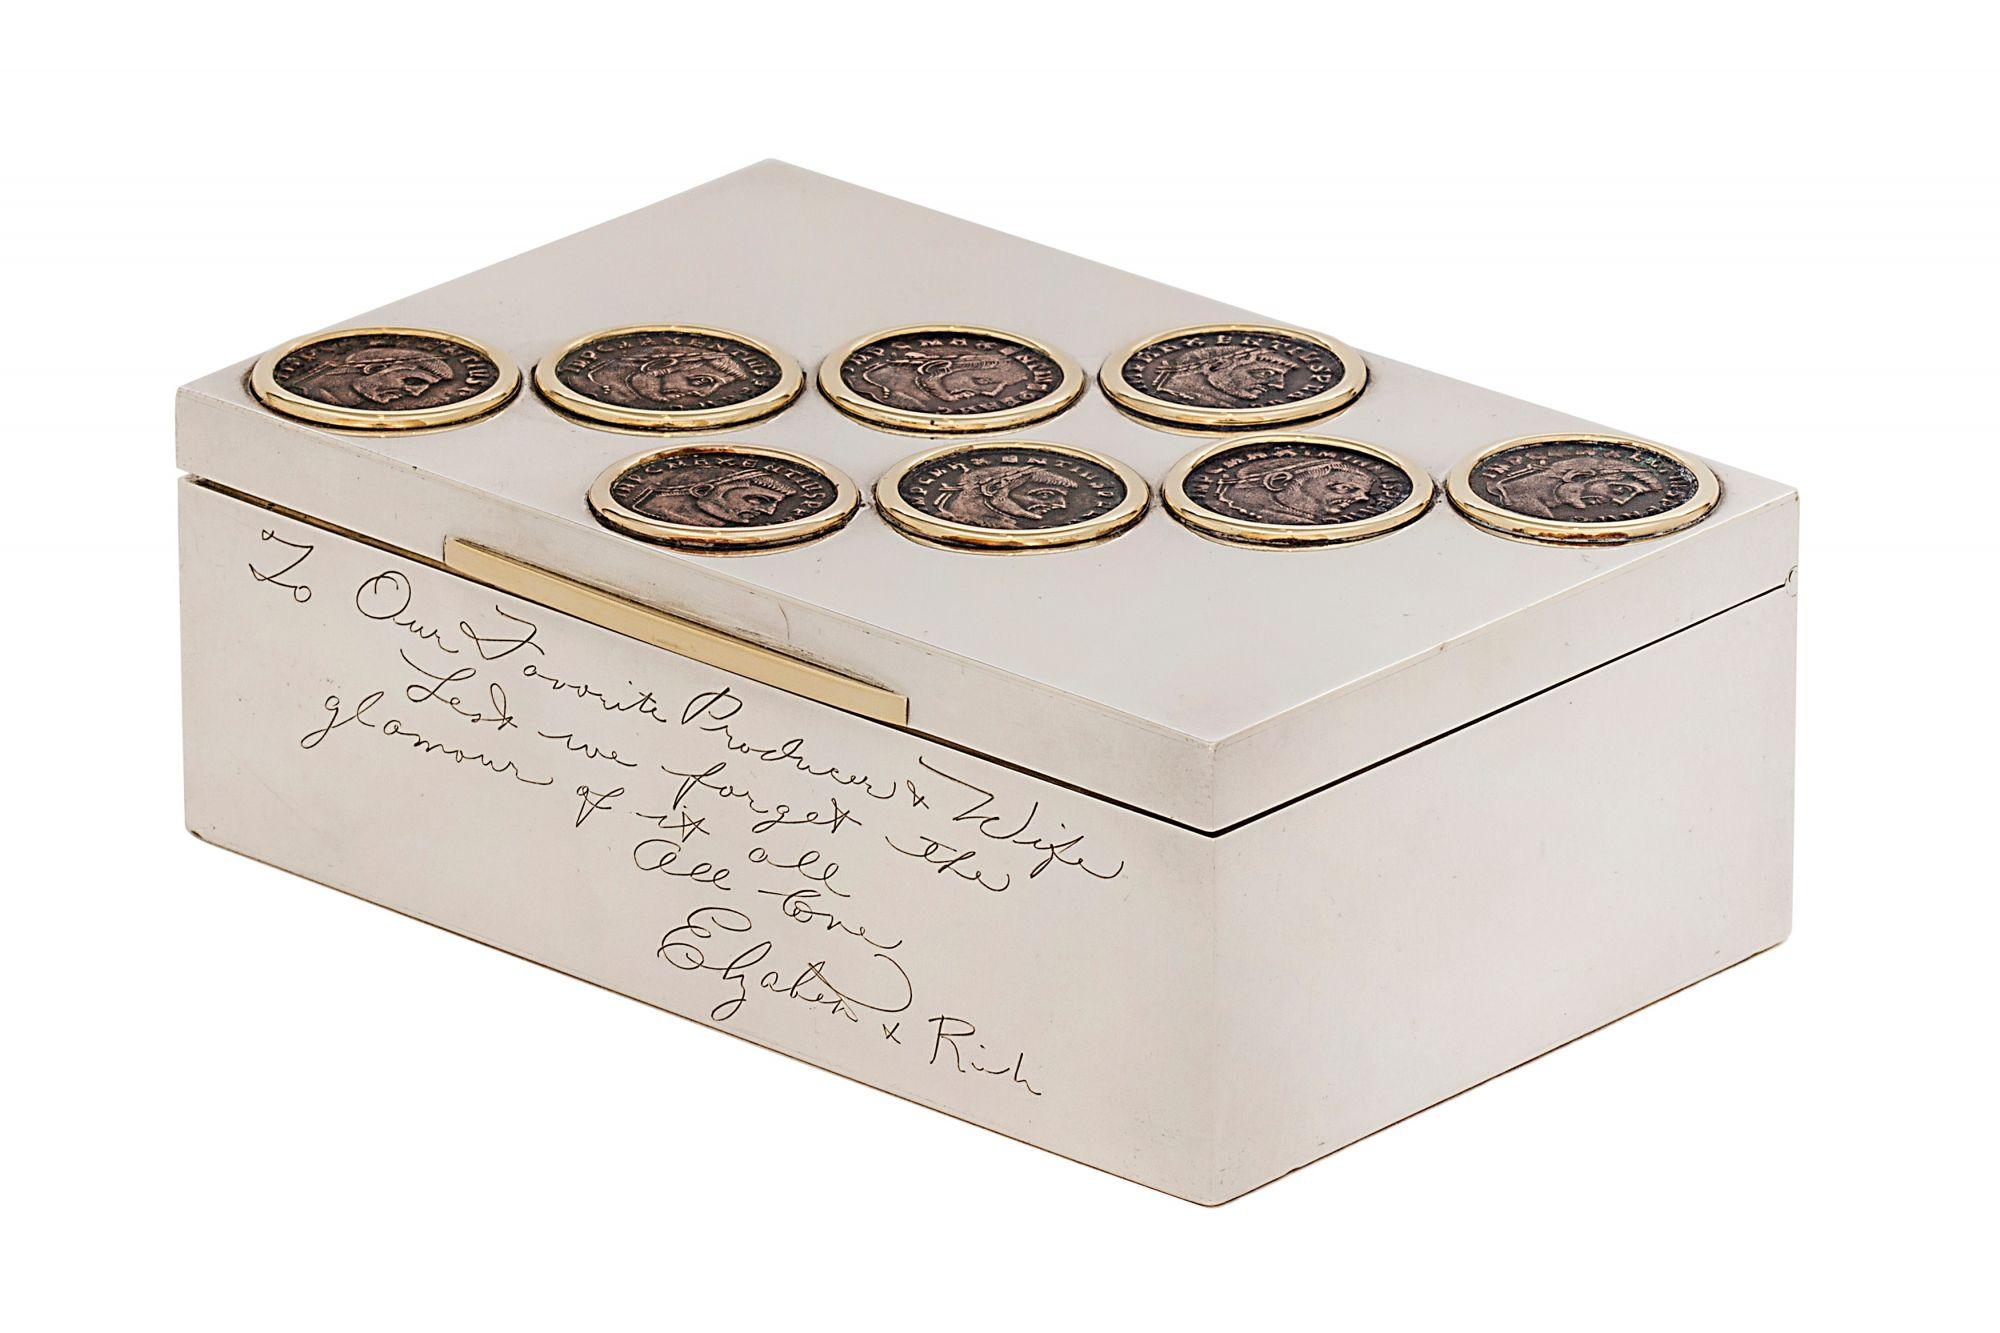 Heritage典藏系列Monete古幣菸盒,1962年by Bulgari。